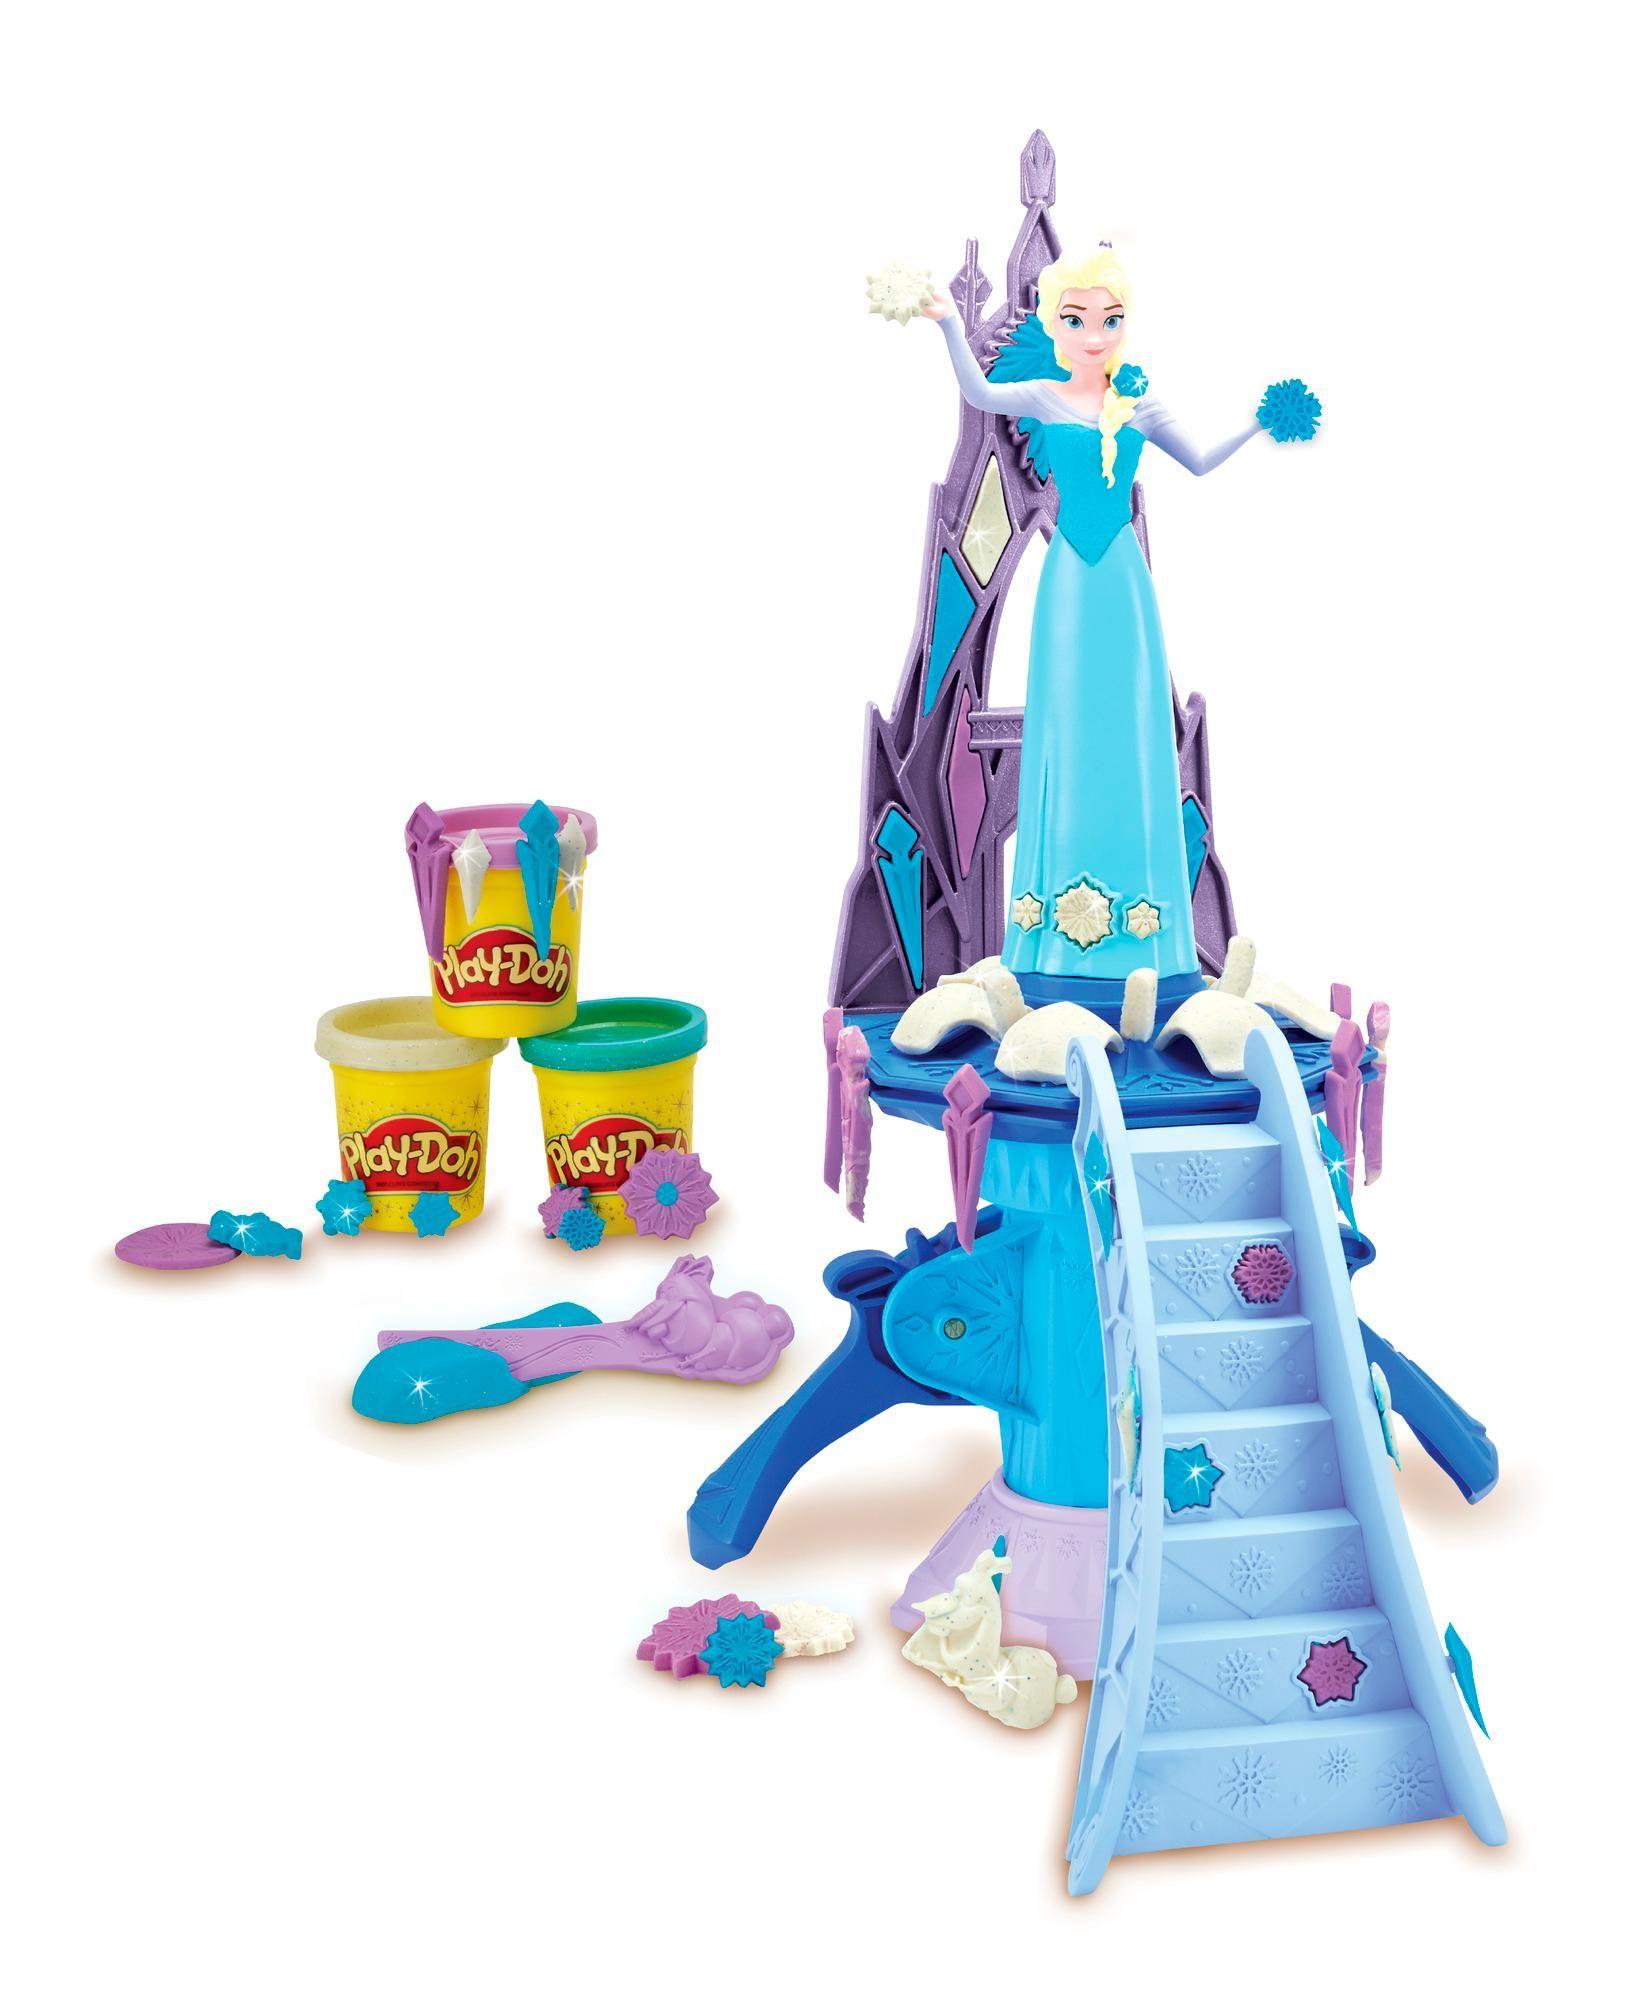 Hasbro Play-Doh B5530EU4 - Die Eiskönigin - Elsa, Knete: Amazon.de: Spielzeug